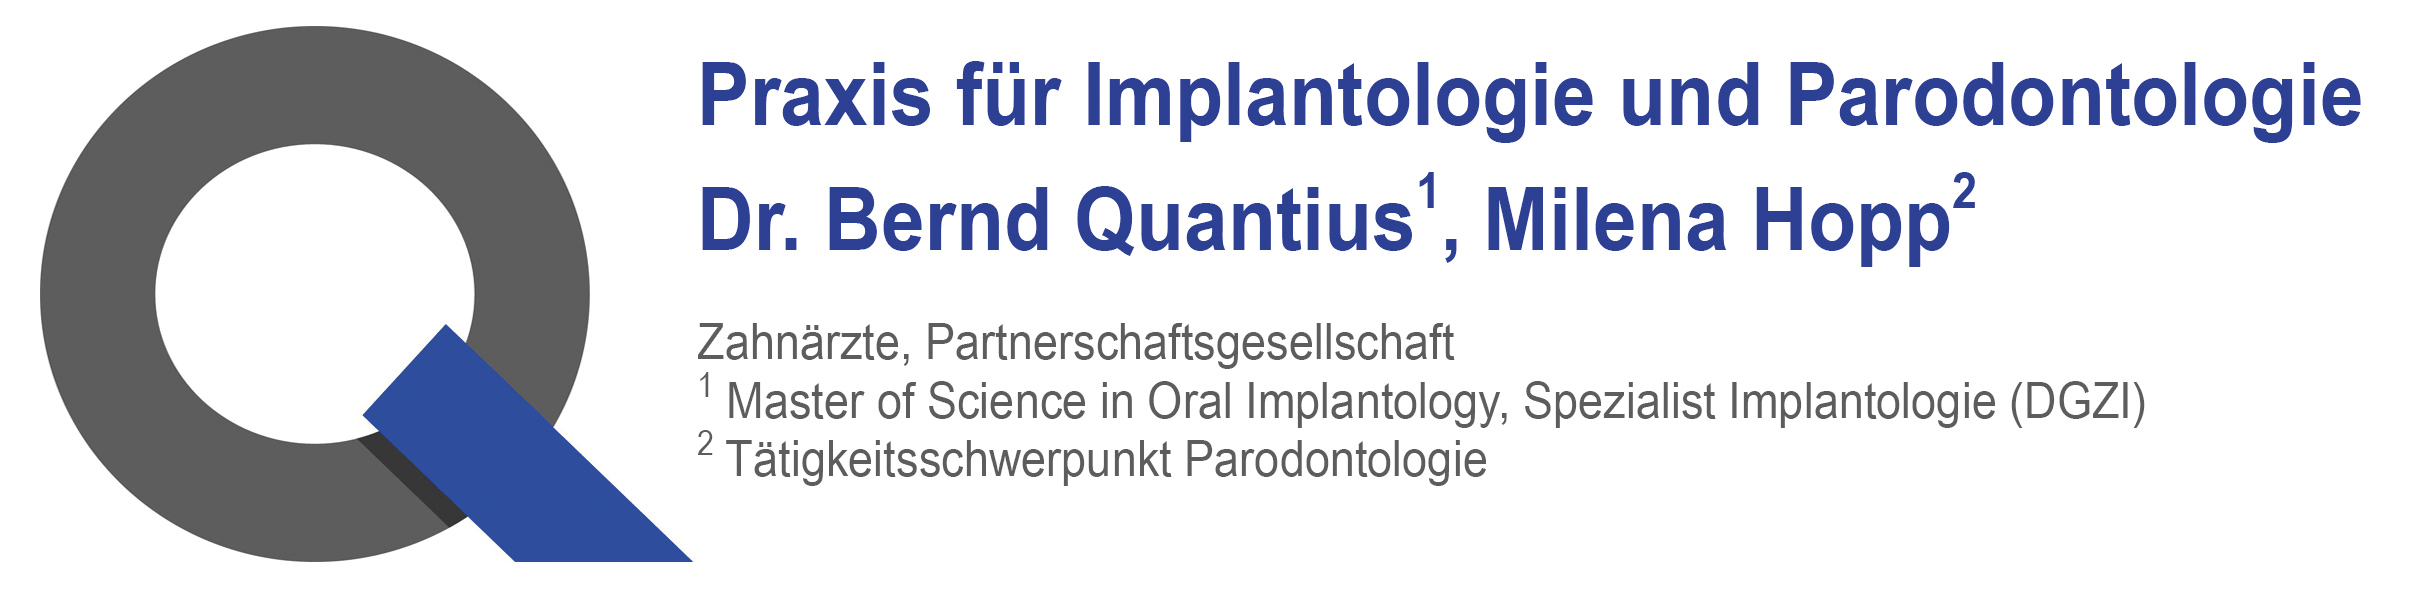 Praxis für Implantologie & Parodontologie Dr. Bernd Quantius M.Sc. und Milena Hopp